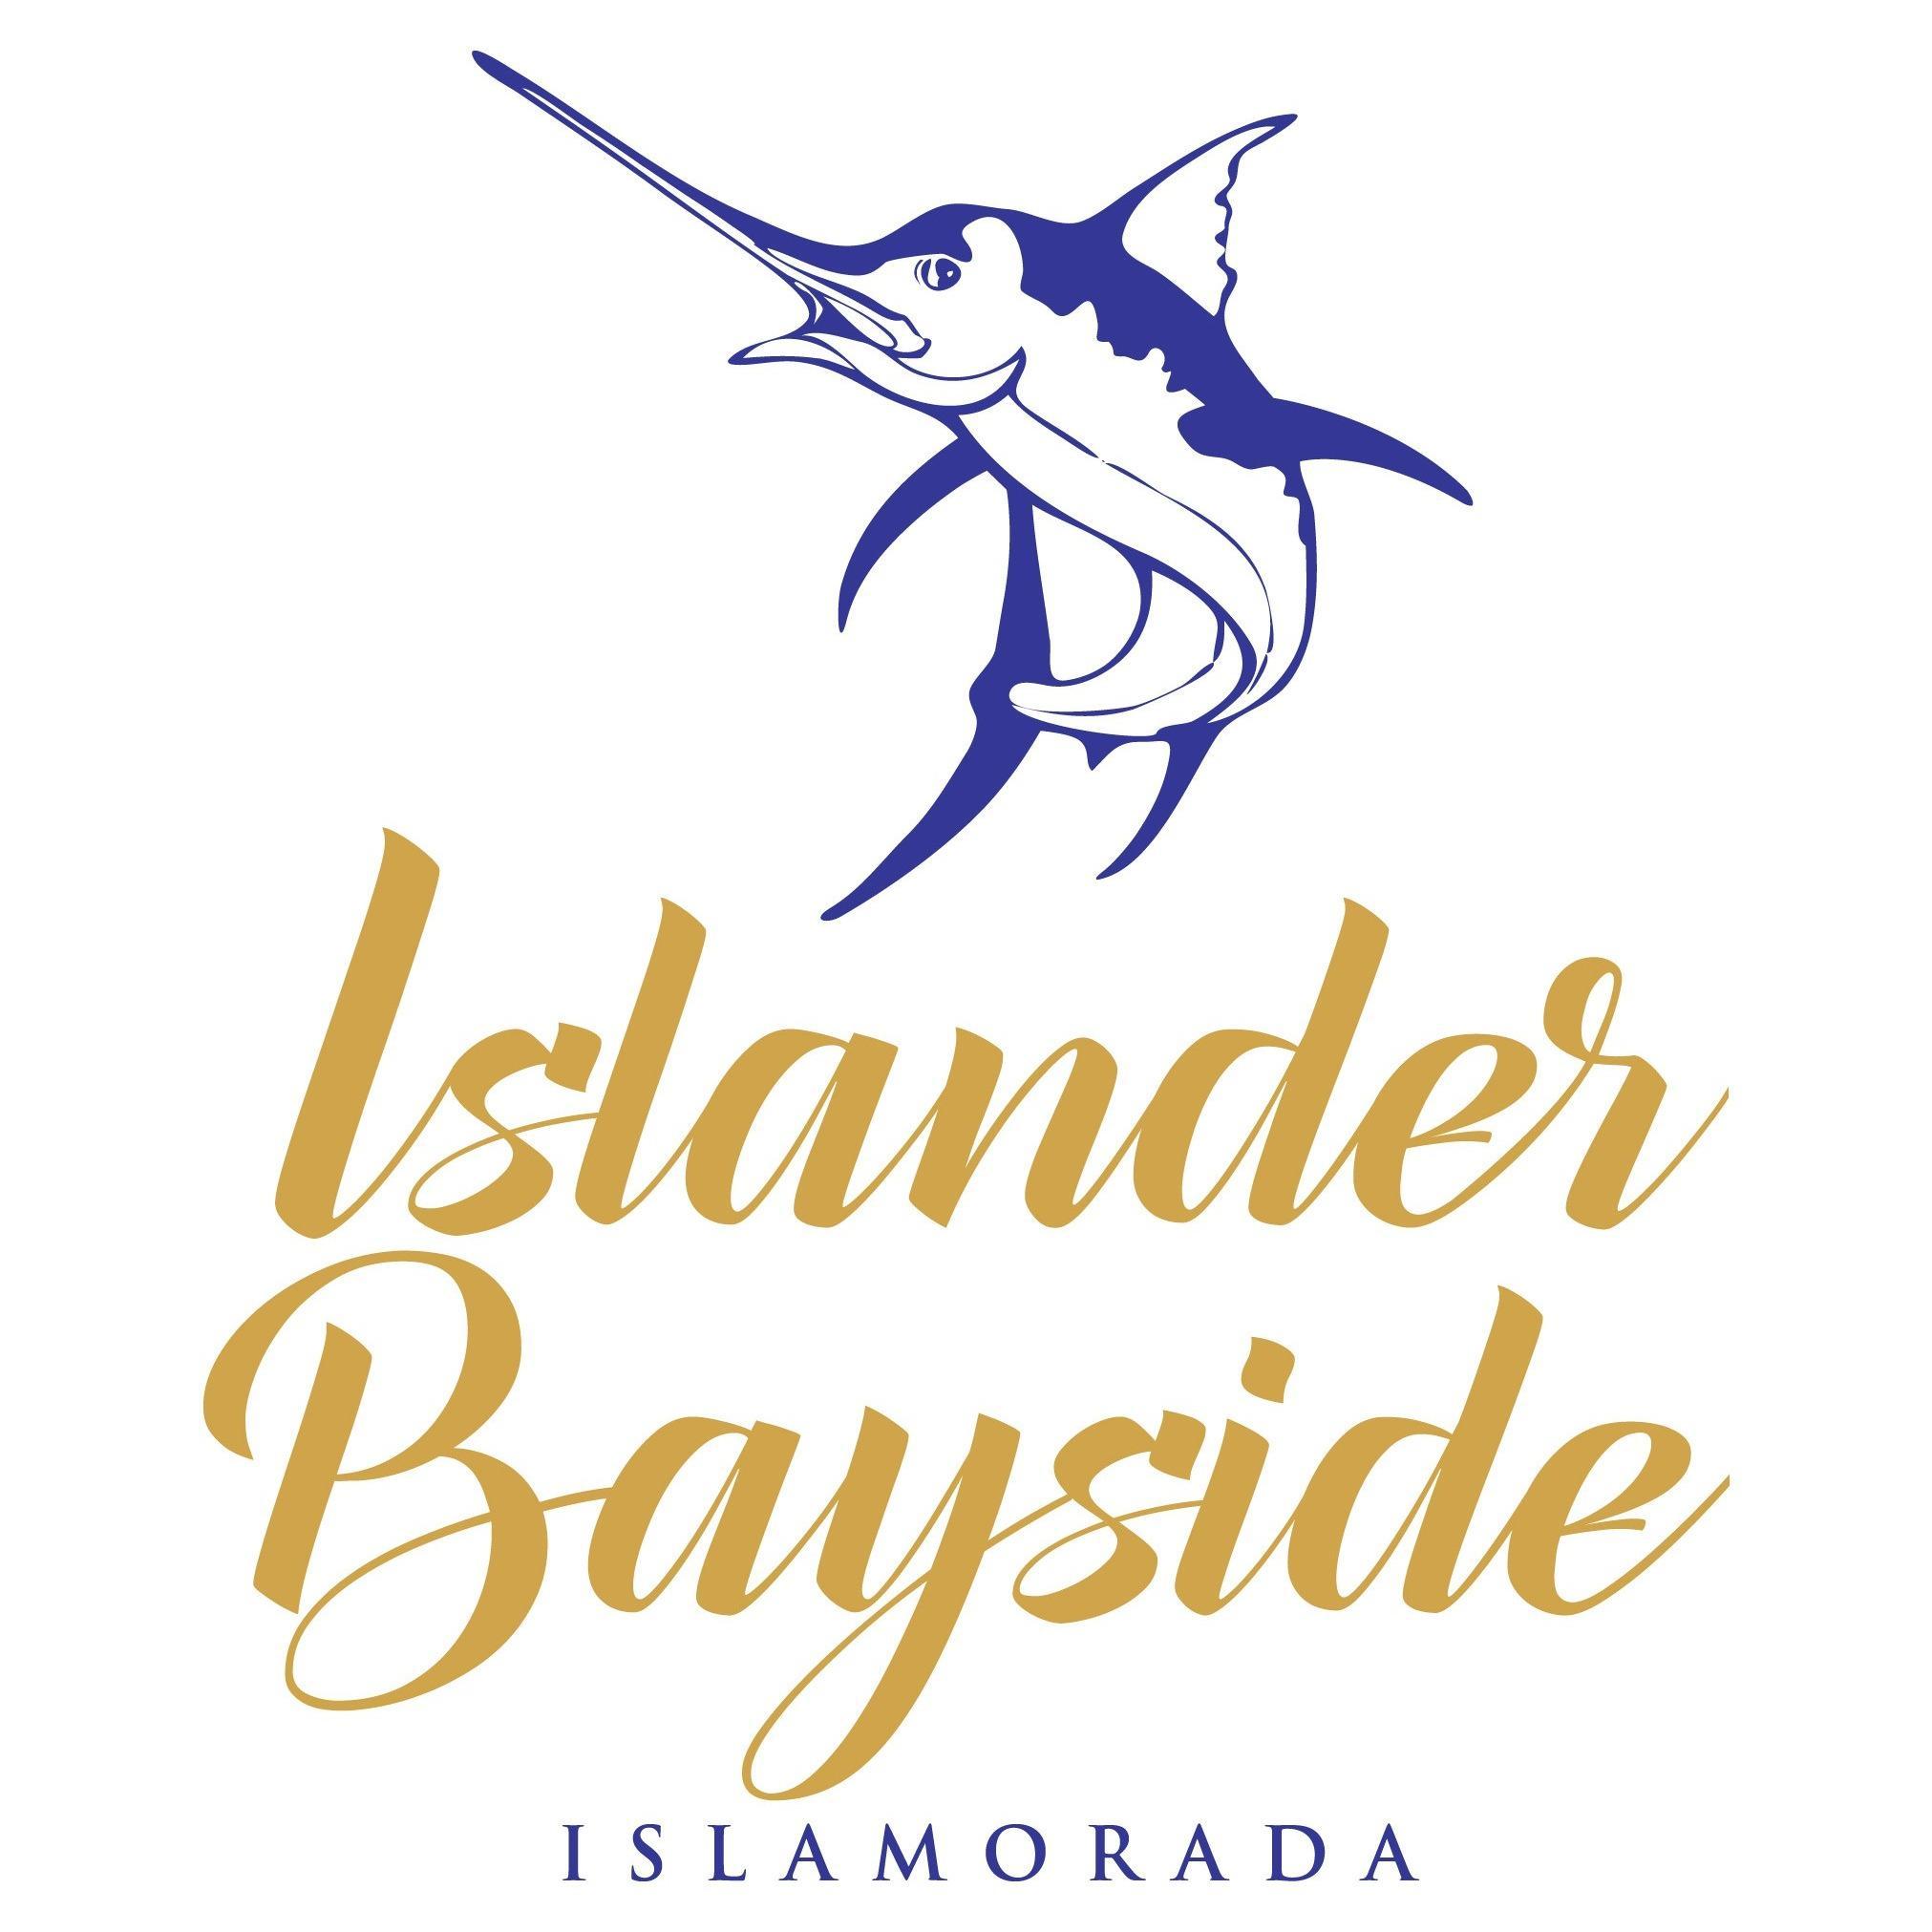 Islander Bayside Townhomes